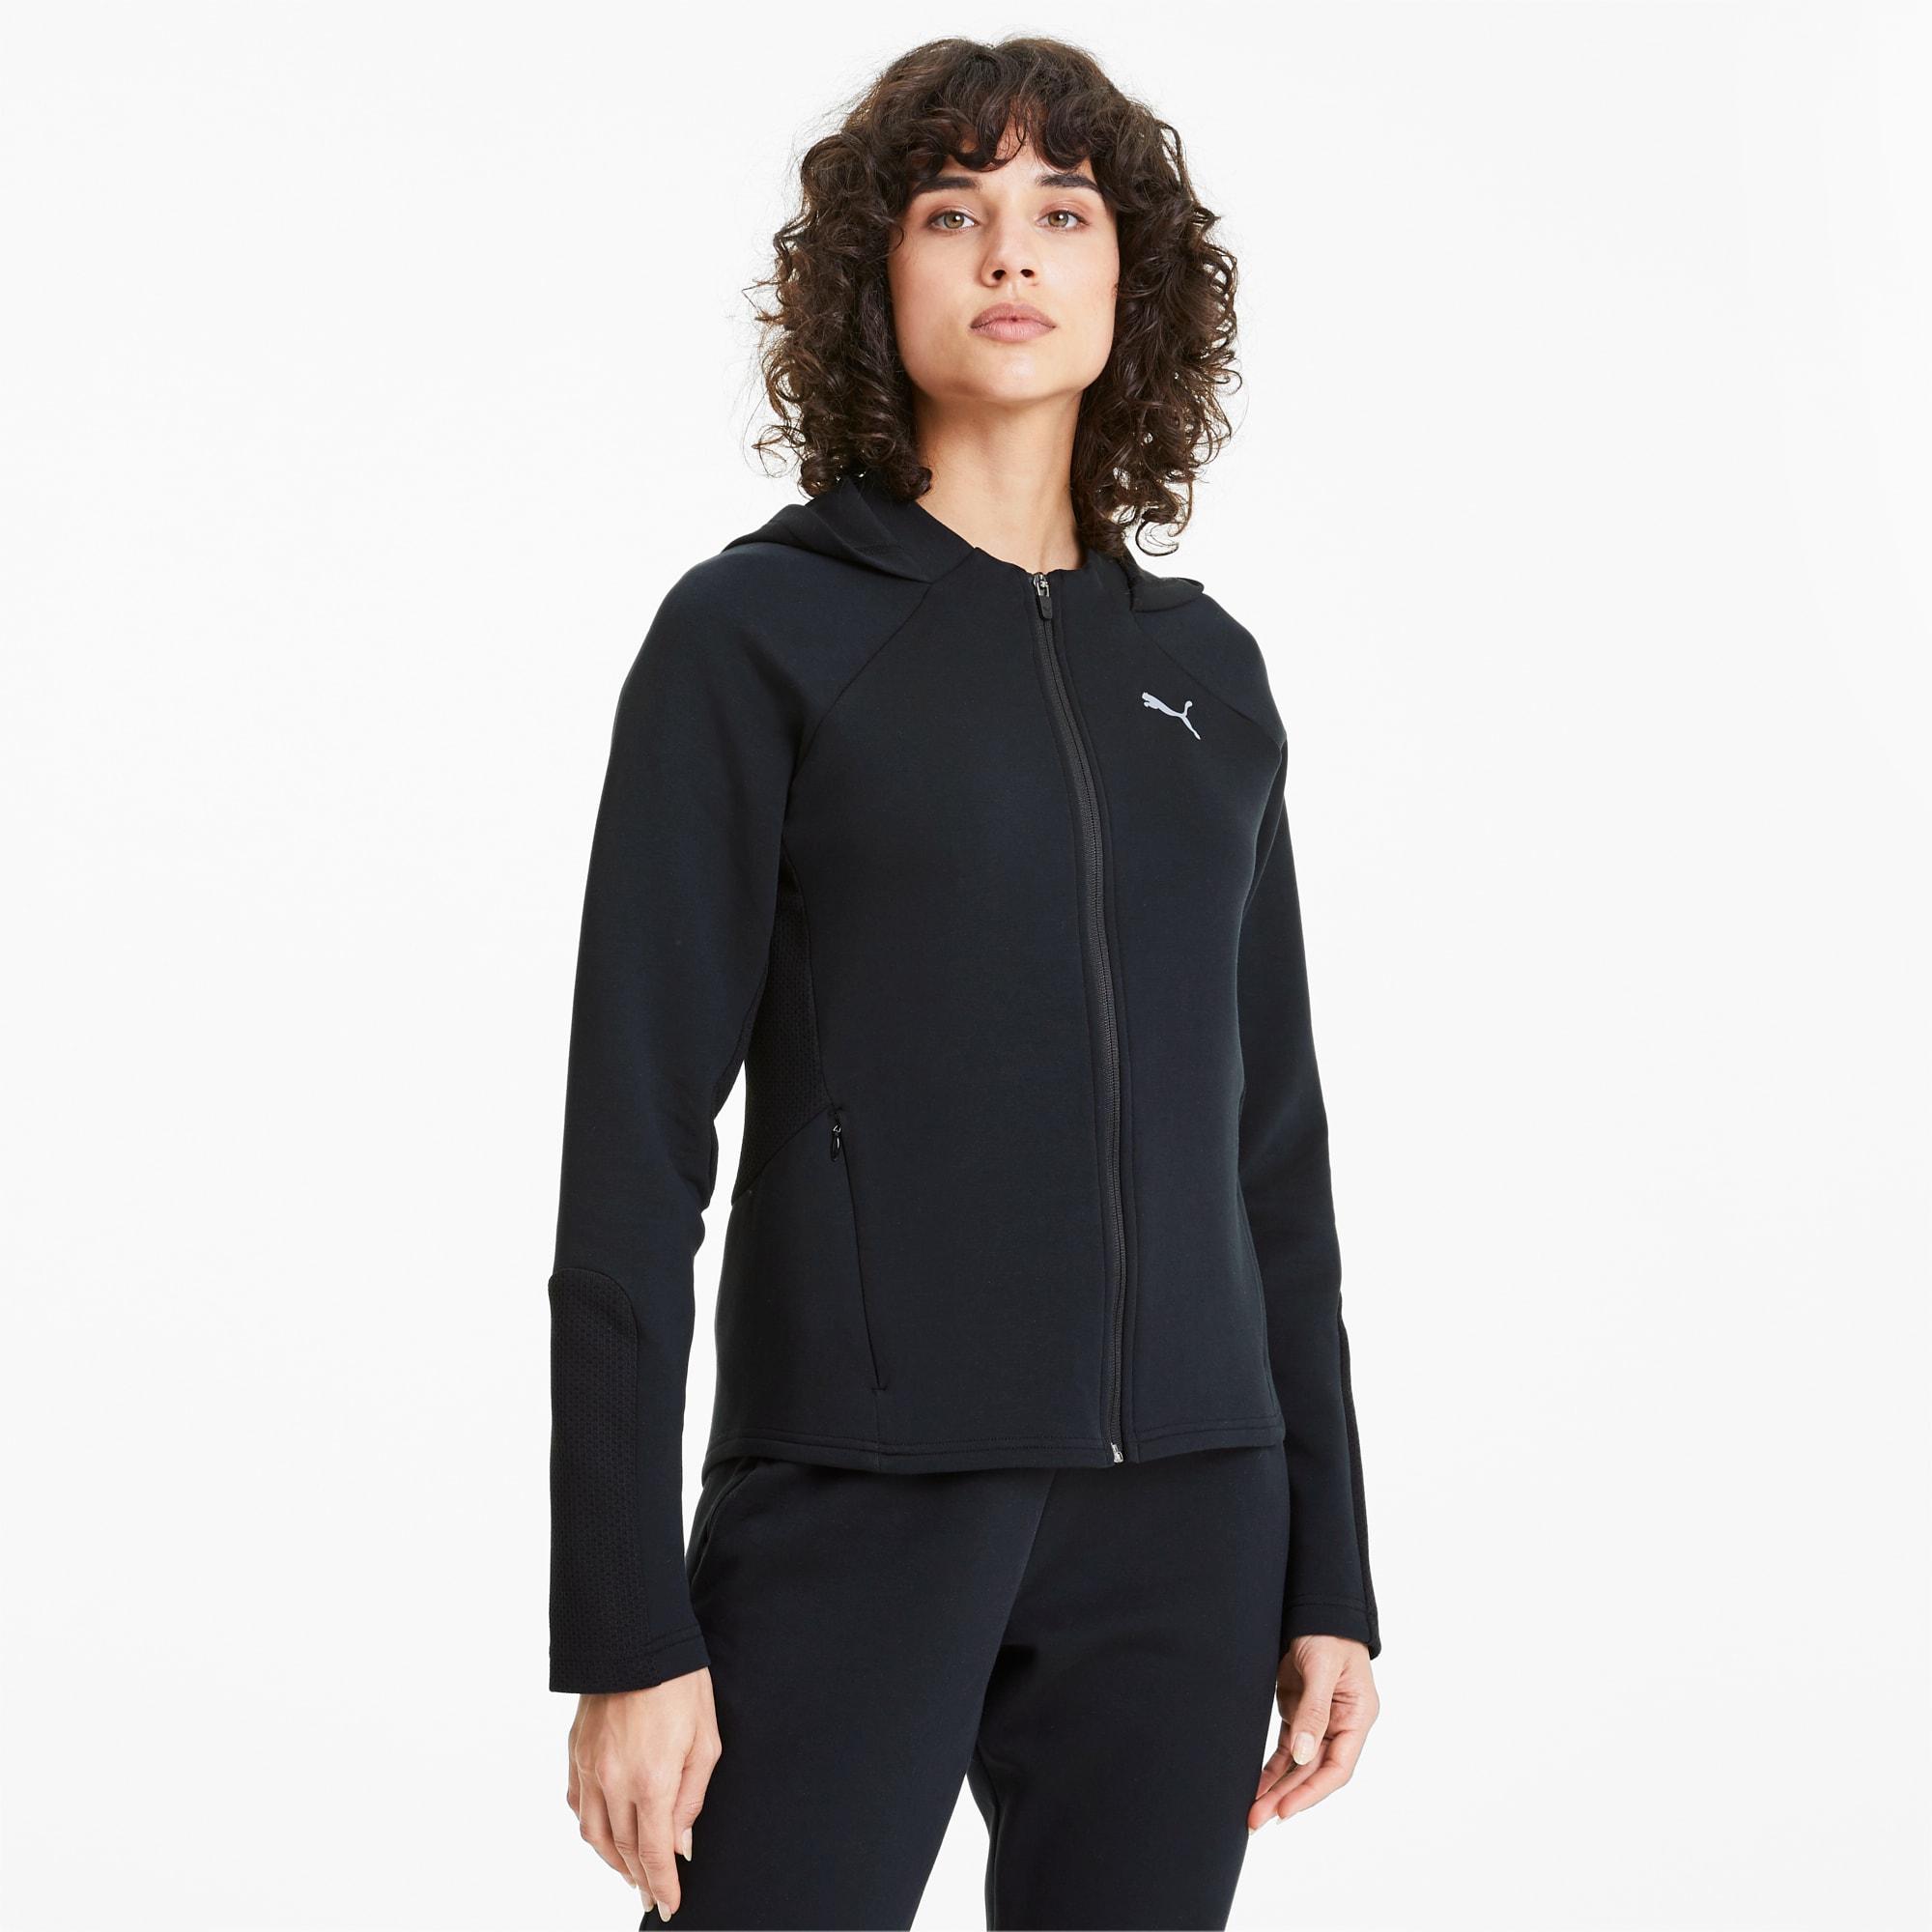 puma Evostripe hoodie met rits voor Dames, ZwartM